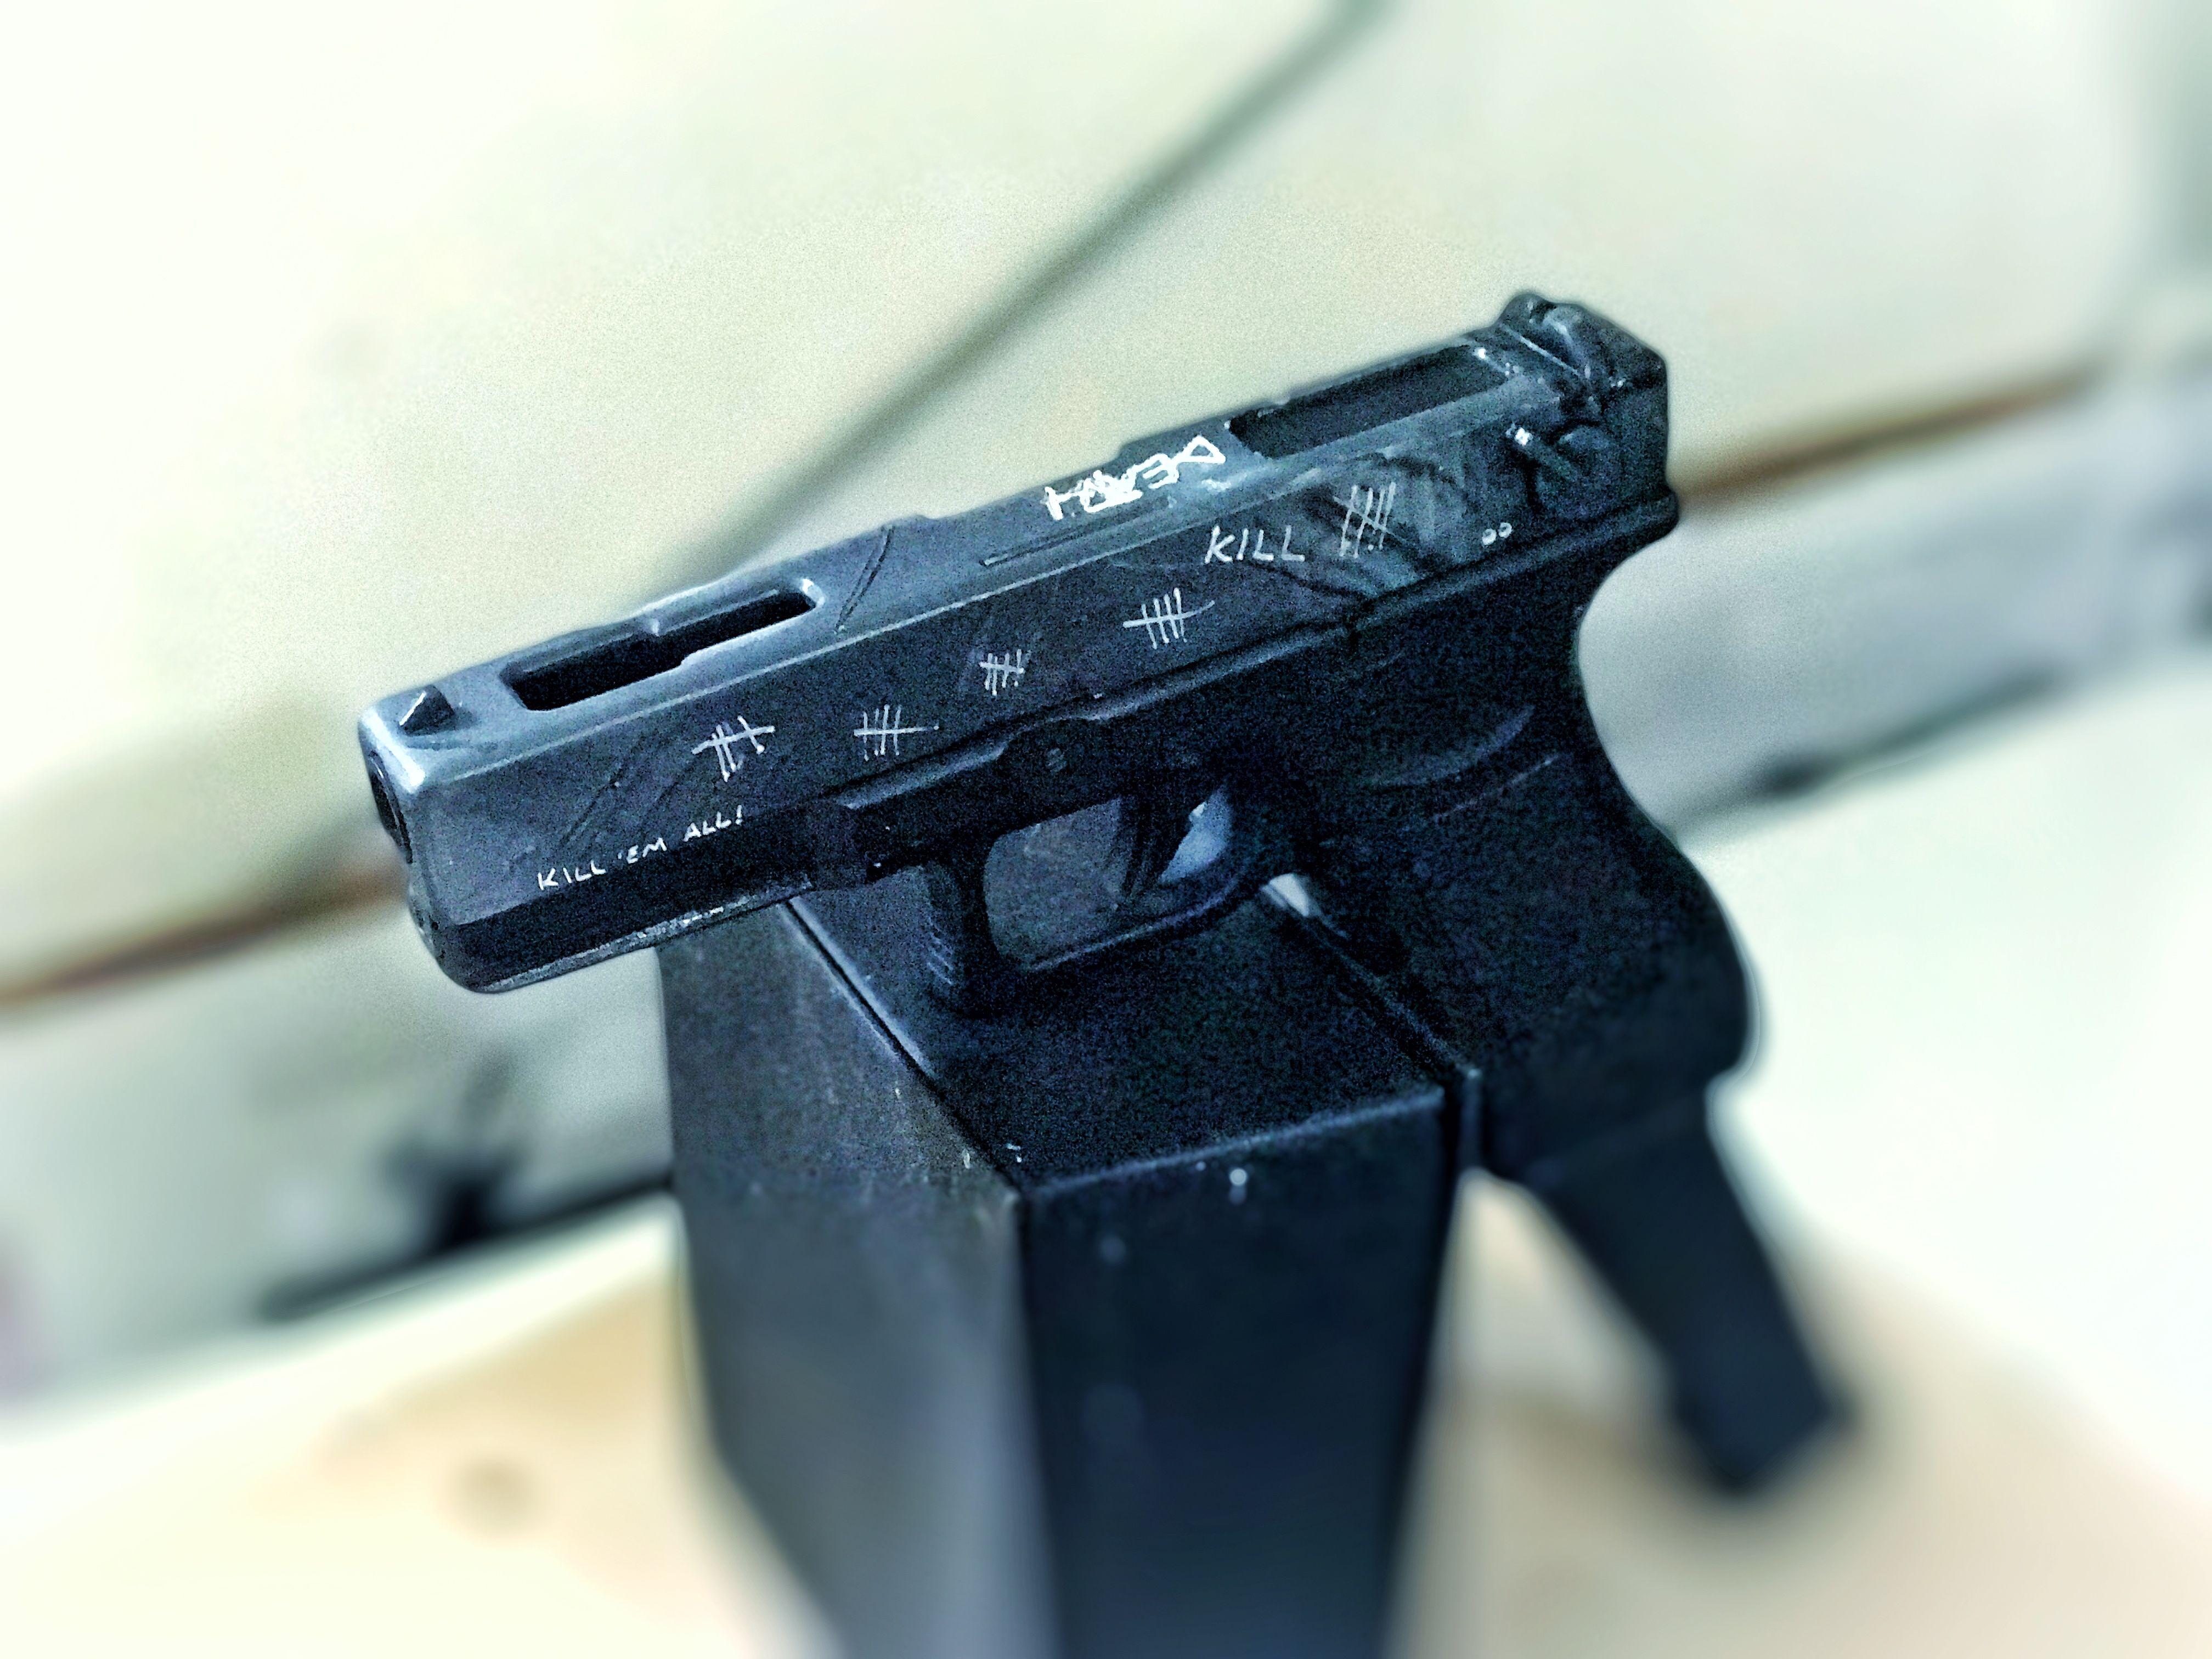 Raw Glock custom